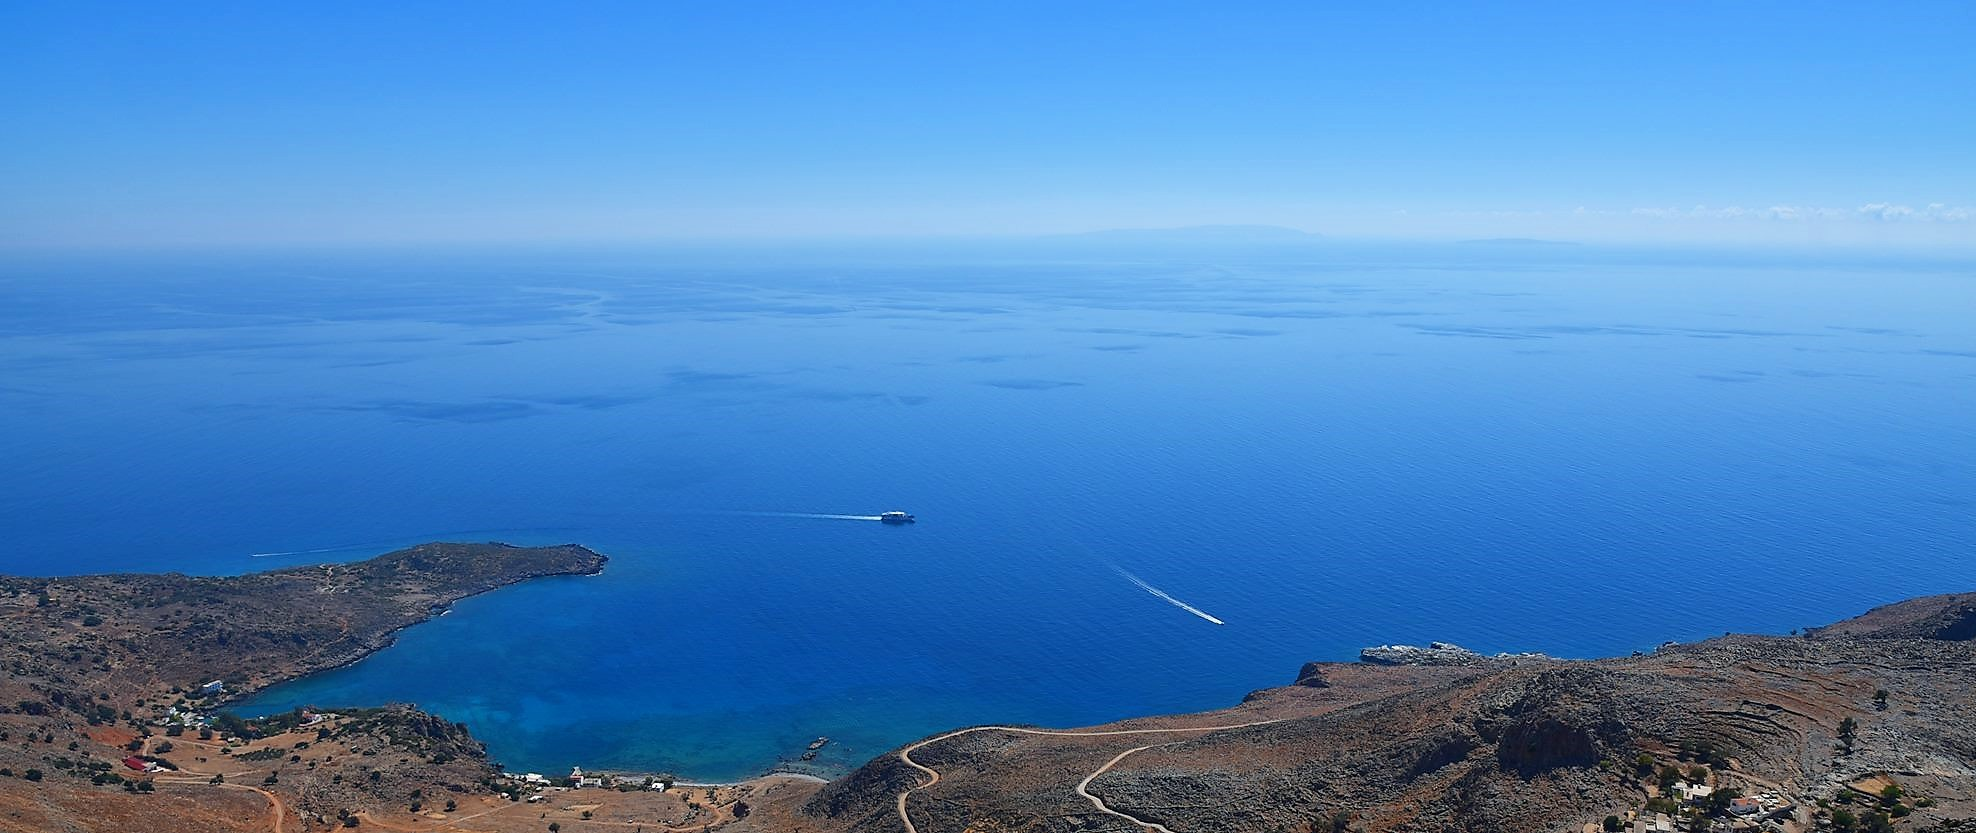 Lykos Bay